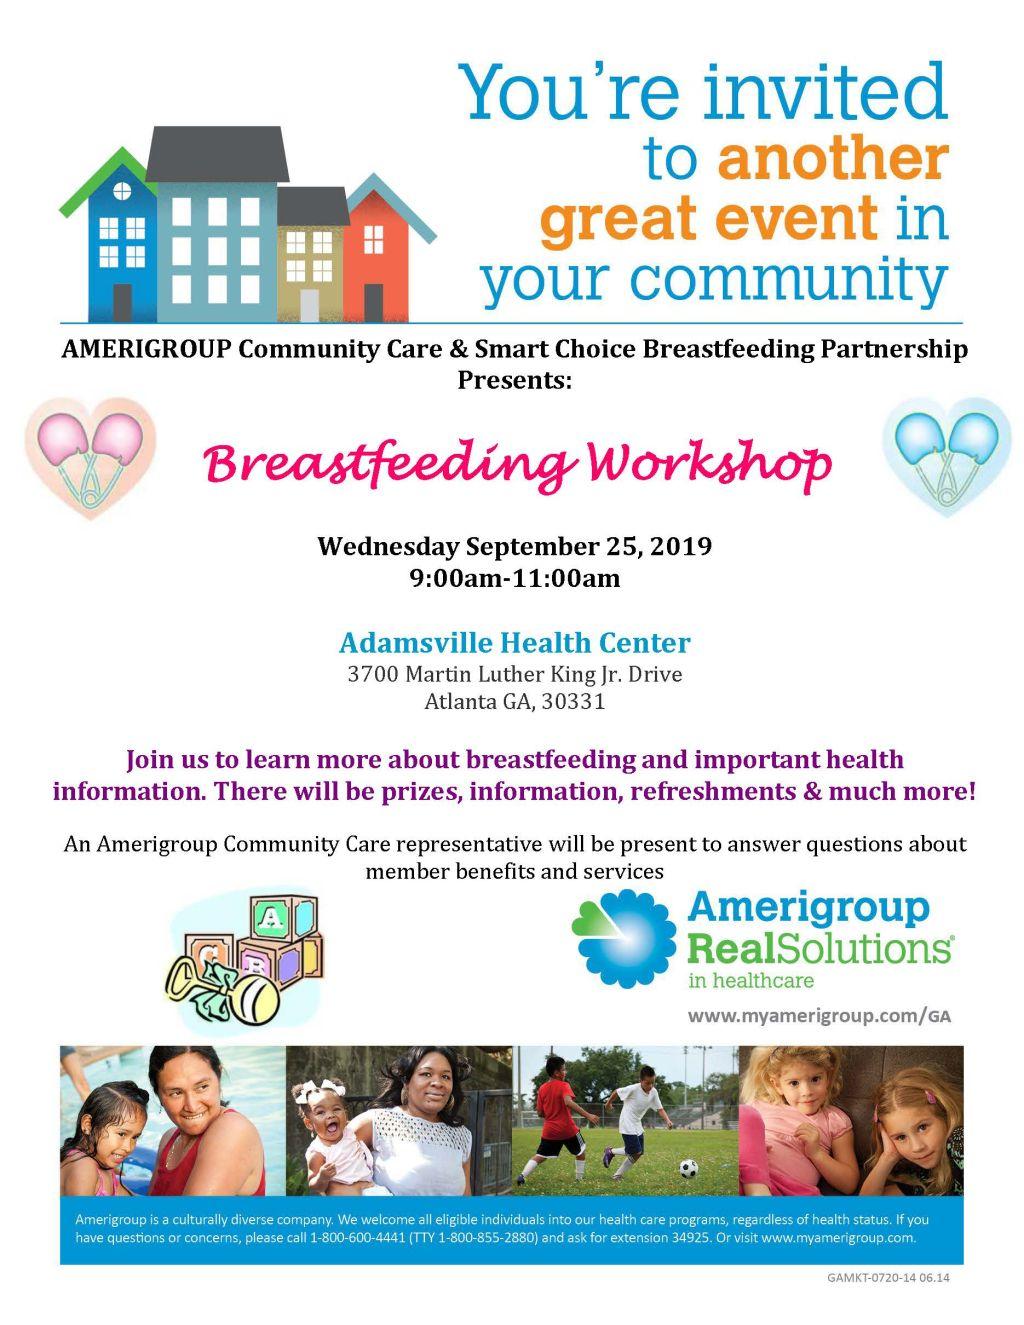 Amerigroup Community Care: Breastfeeding Workshop